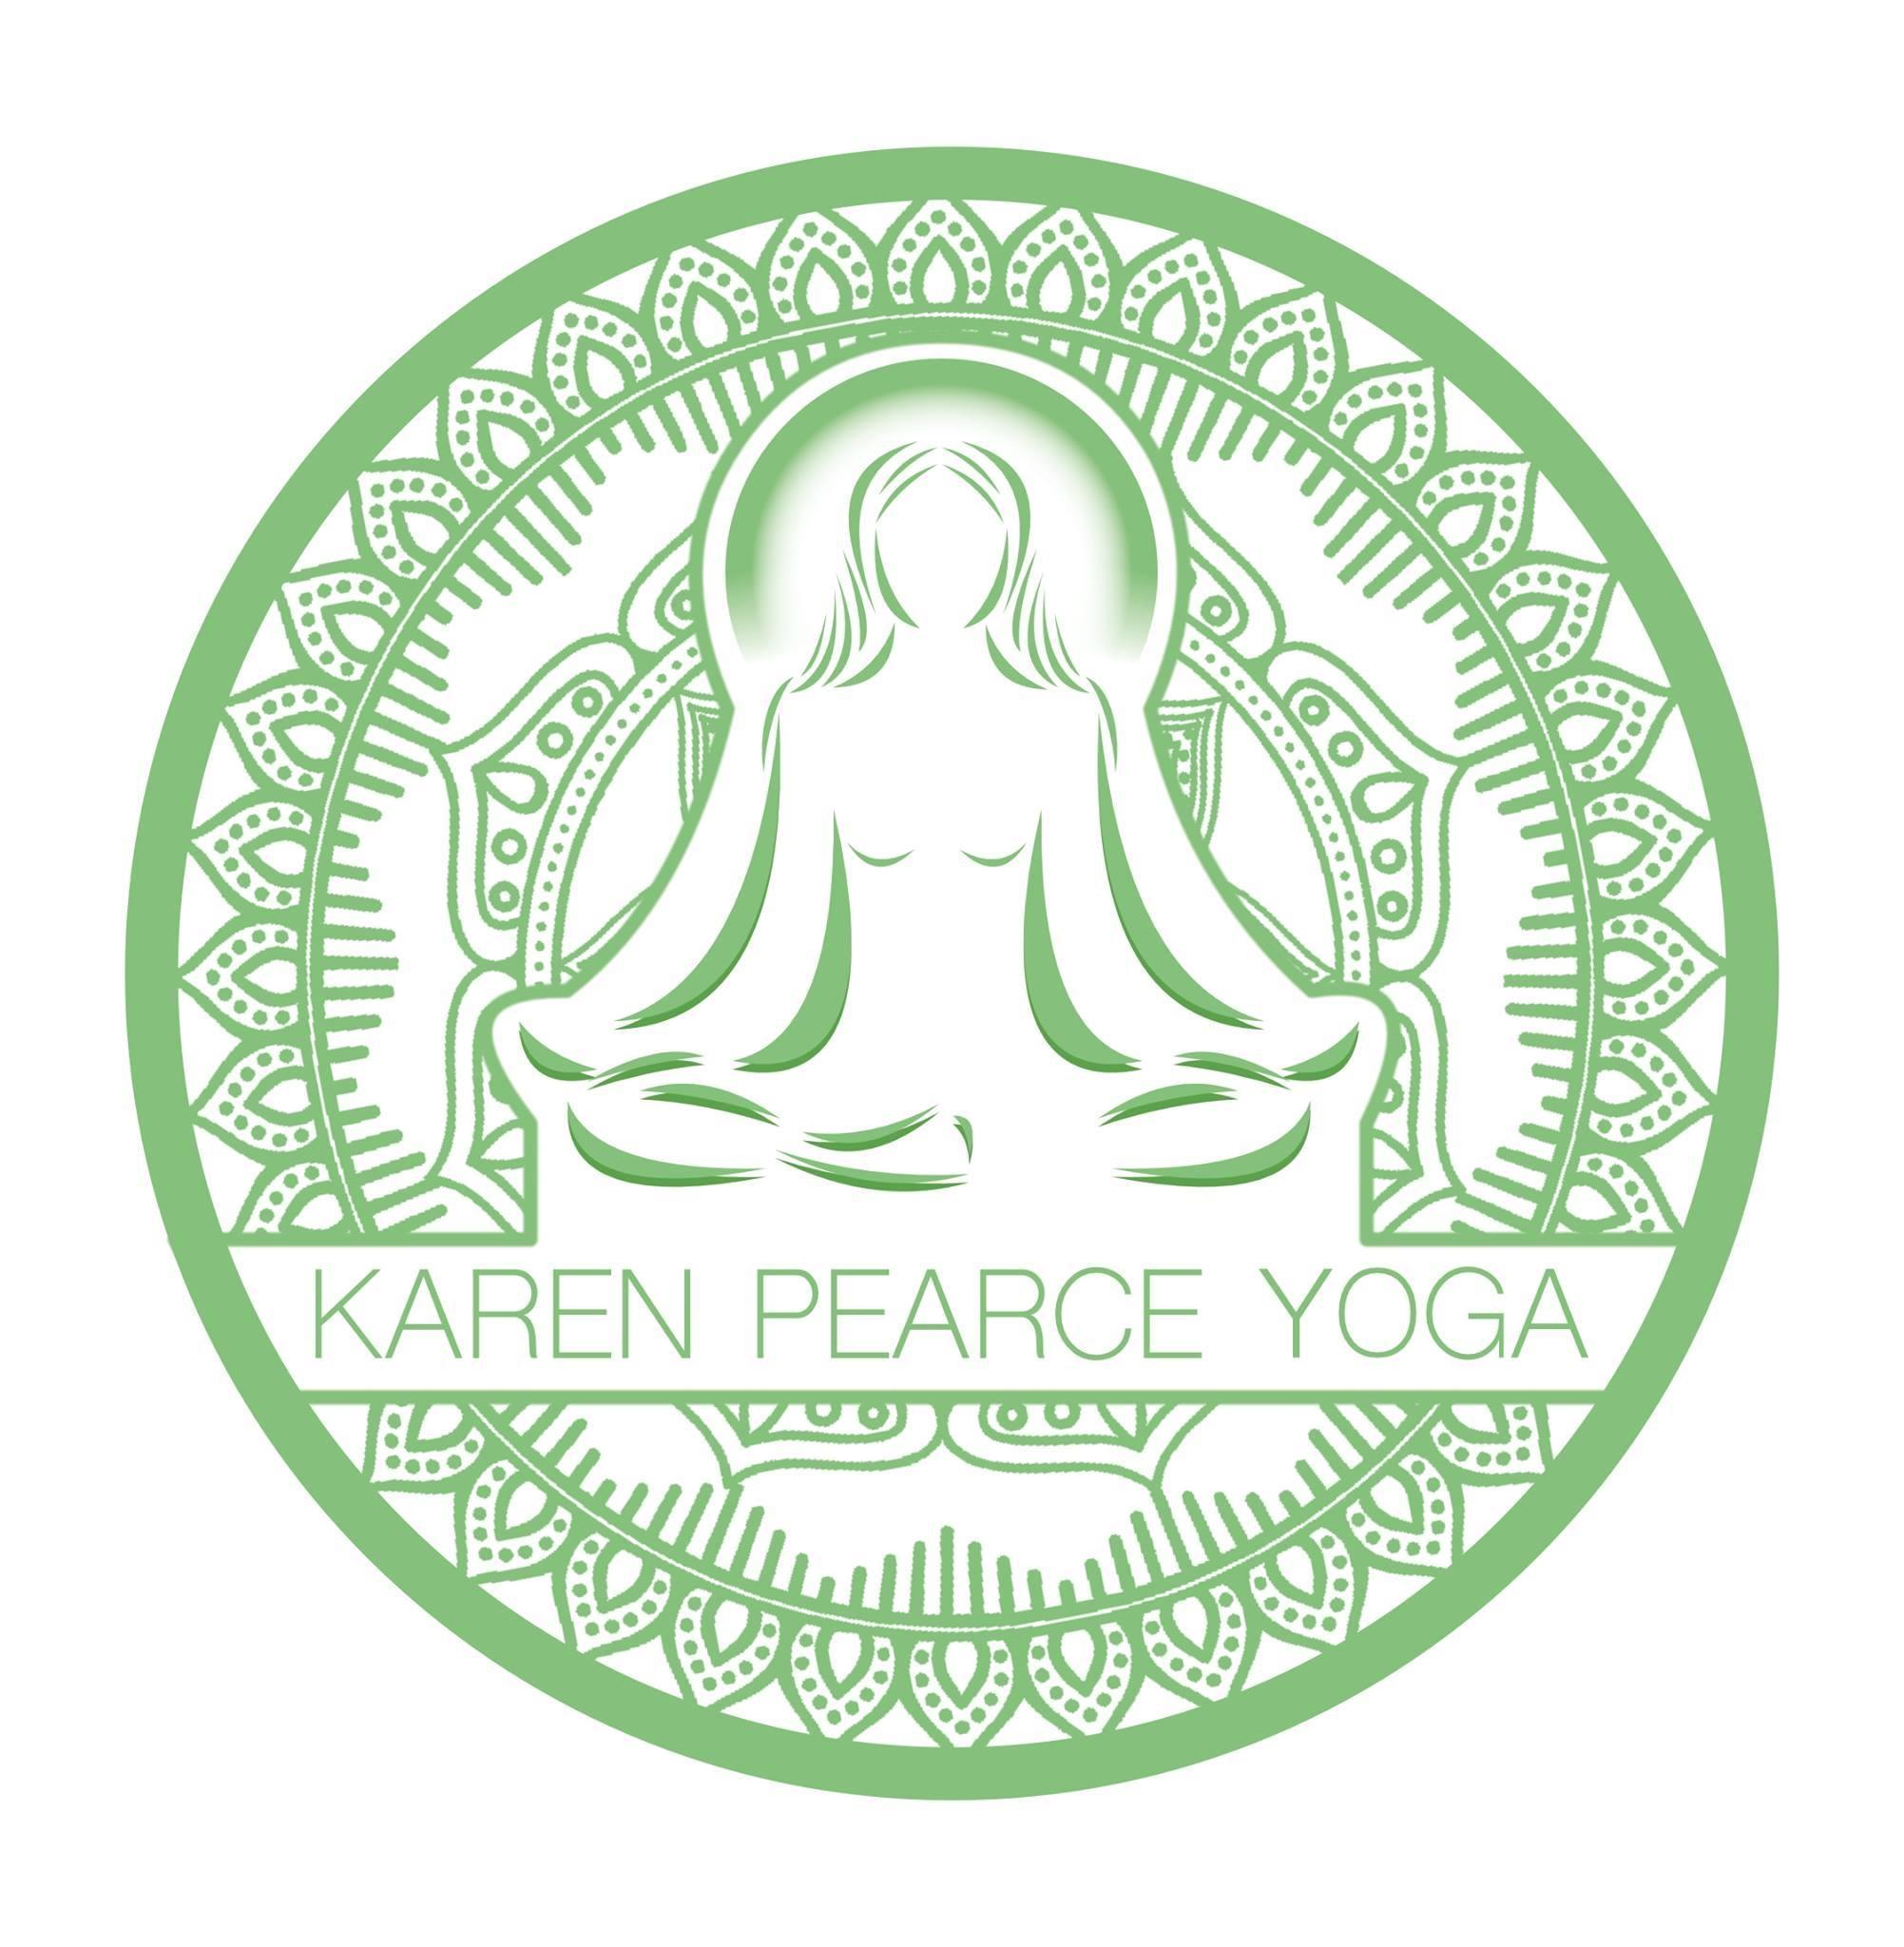 Karen Pearce Yoga's logo